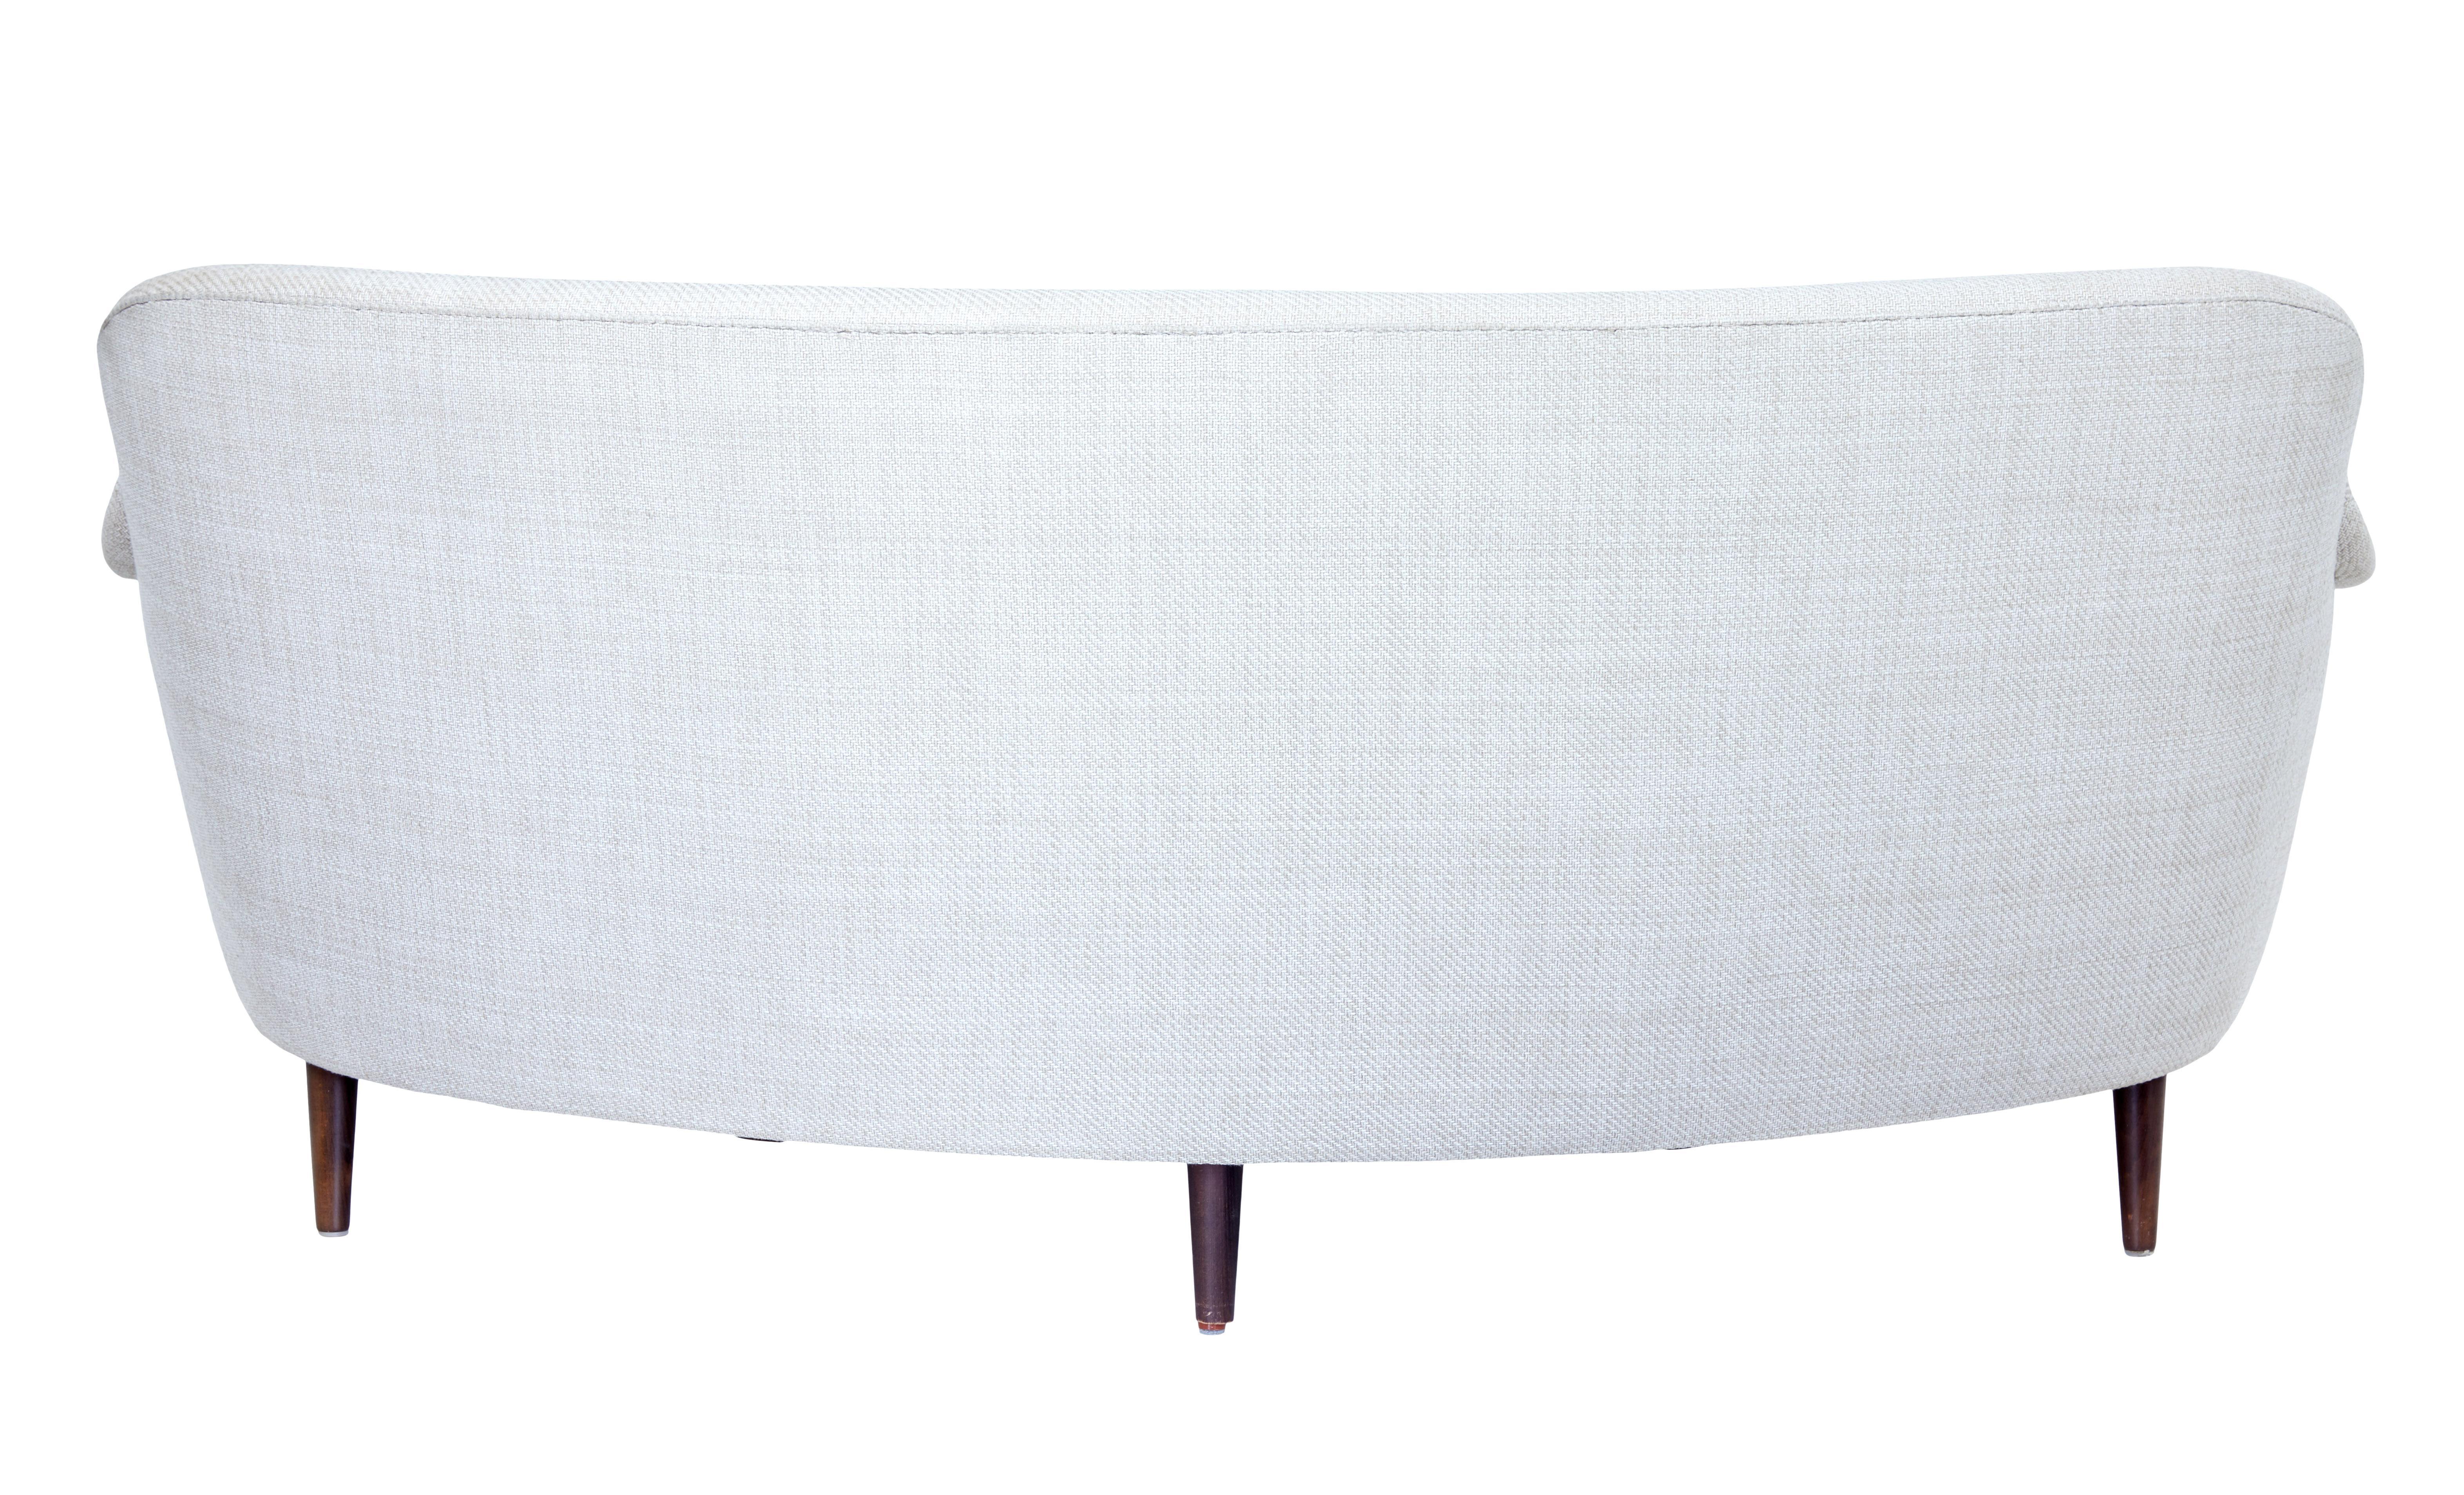 Pair Of 20th Century Shaped Sofas By Carl Malmsten Samsas Rund